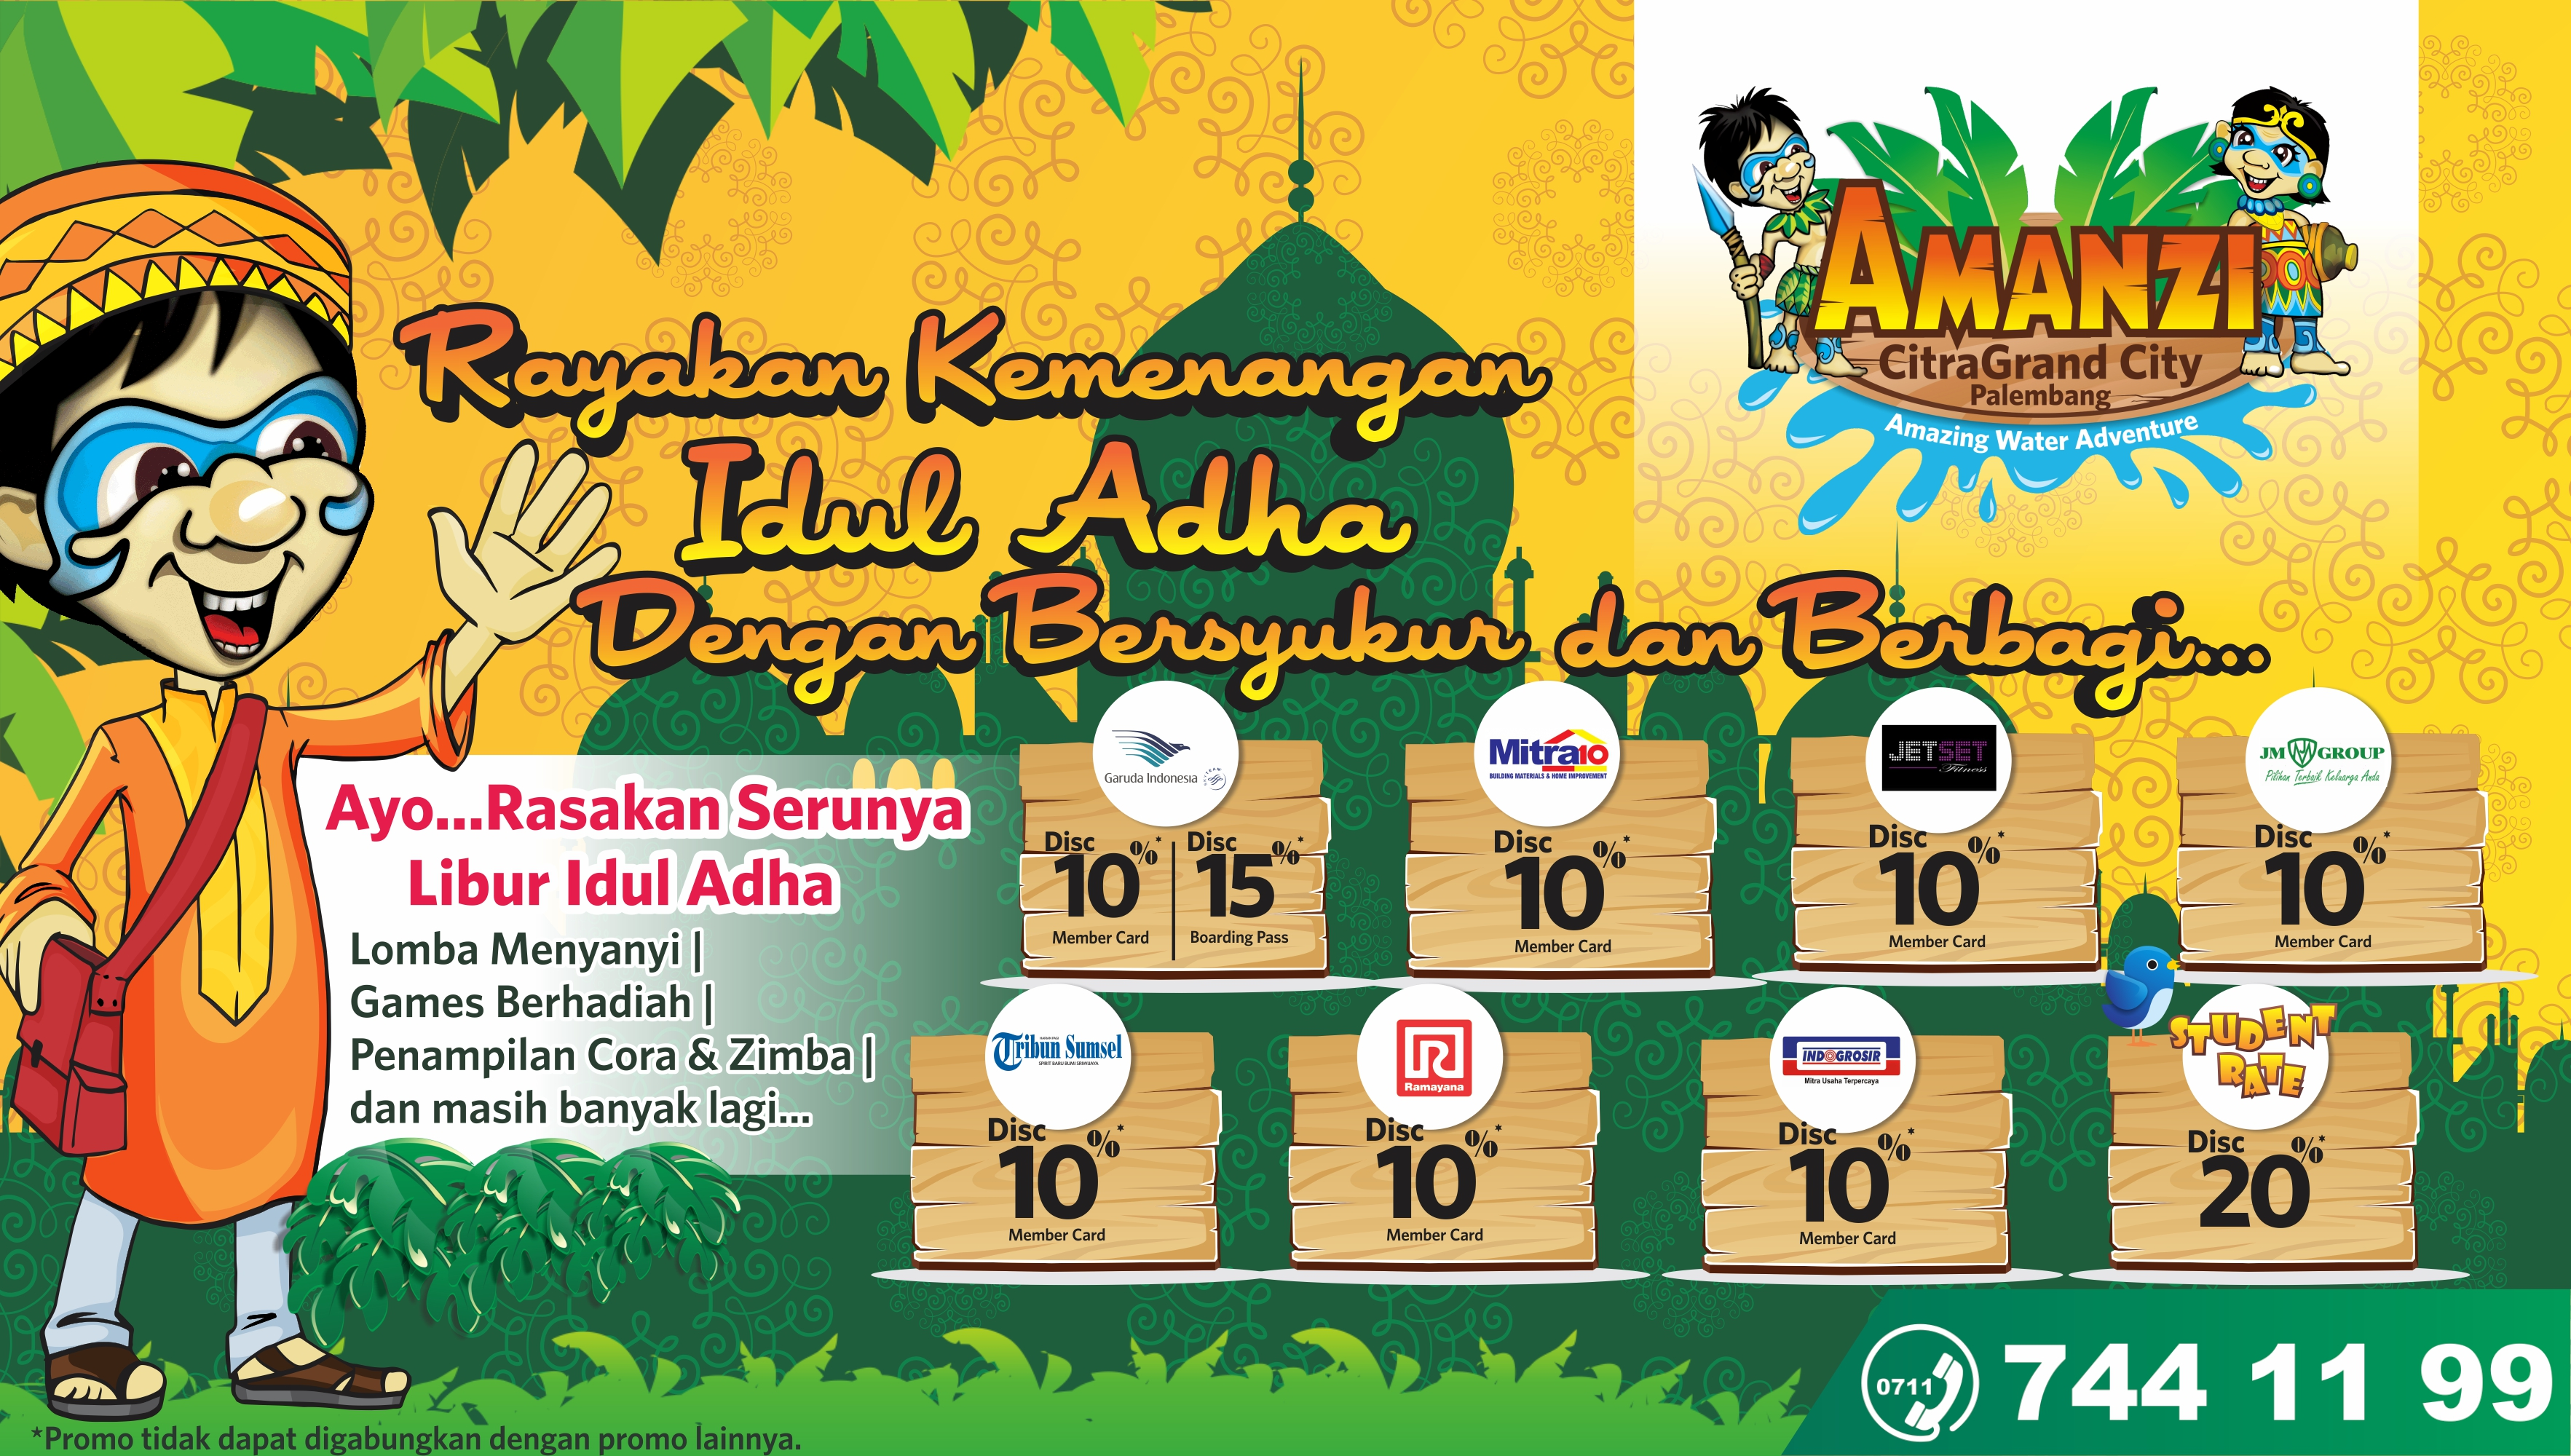 Libur Idul Adha Amanzi WaterPark Geber Amazing Promo